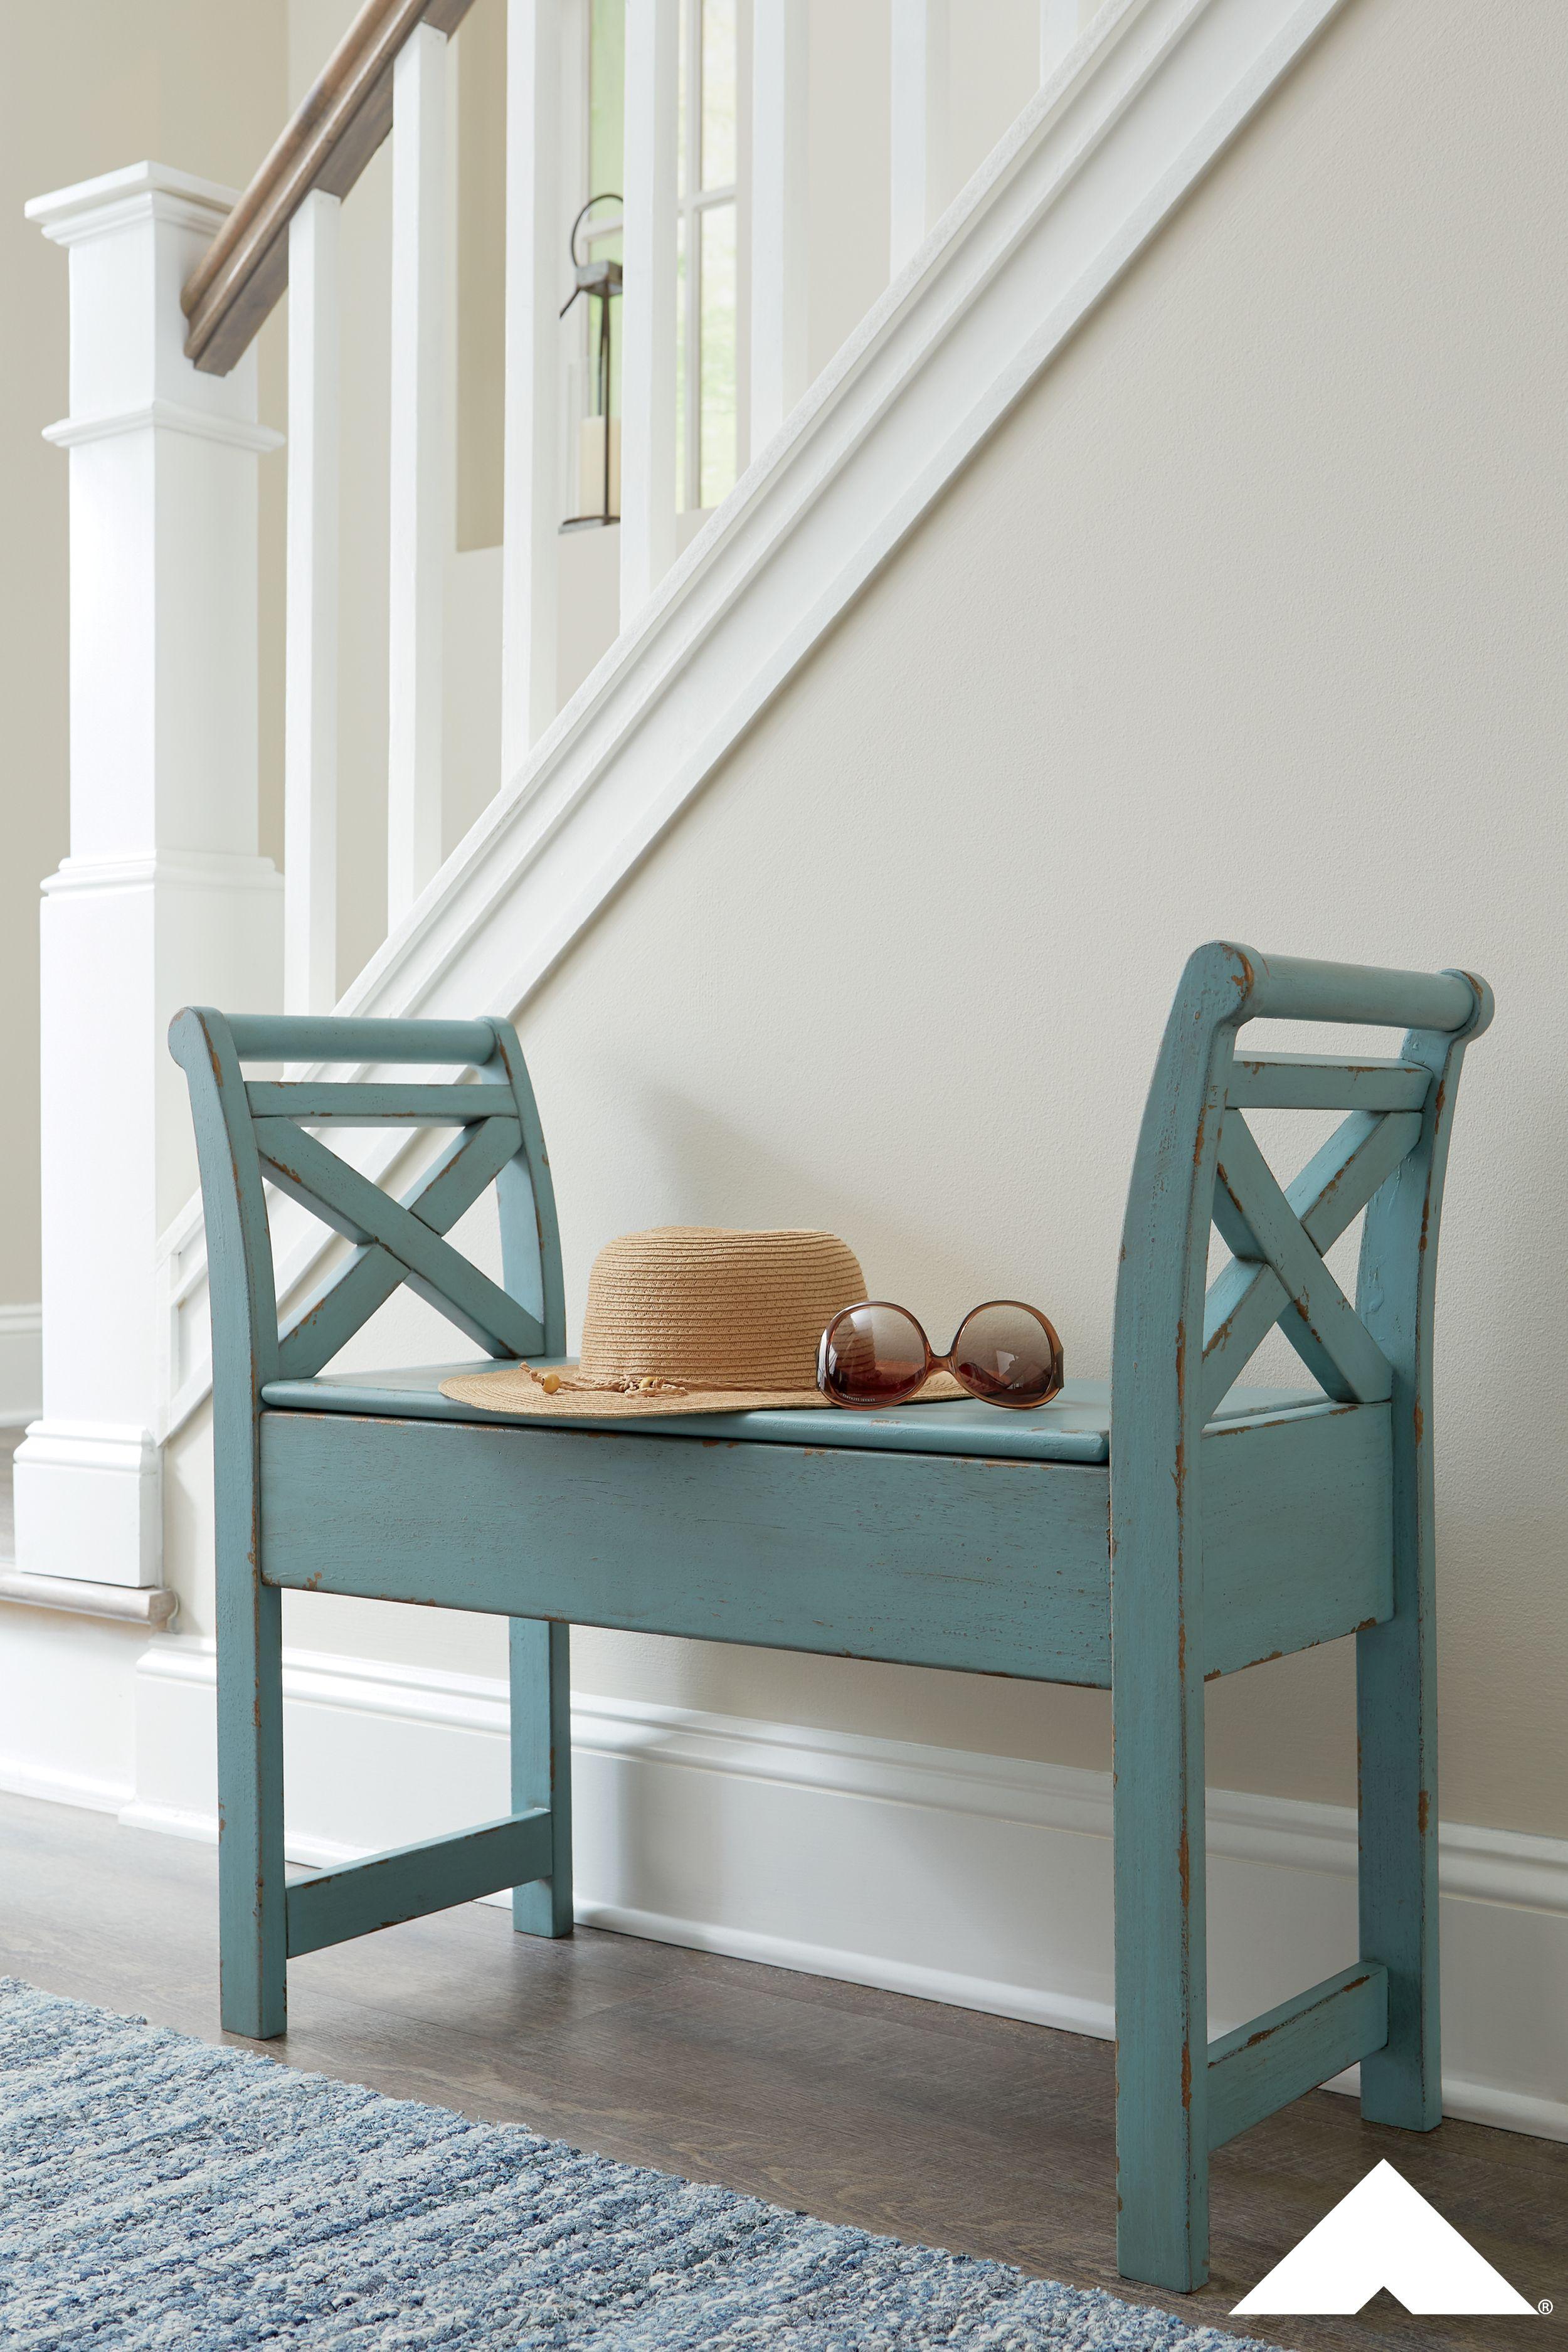 Heron Ridge Blue Accent Bench By Ashley Furniture Ashleyfurniture Homedecor Summerstyle